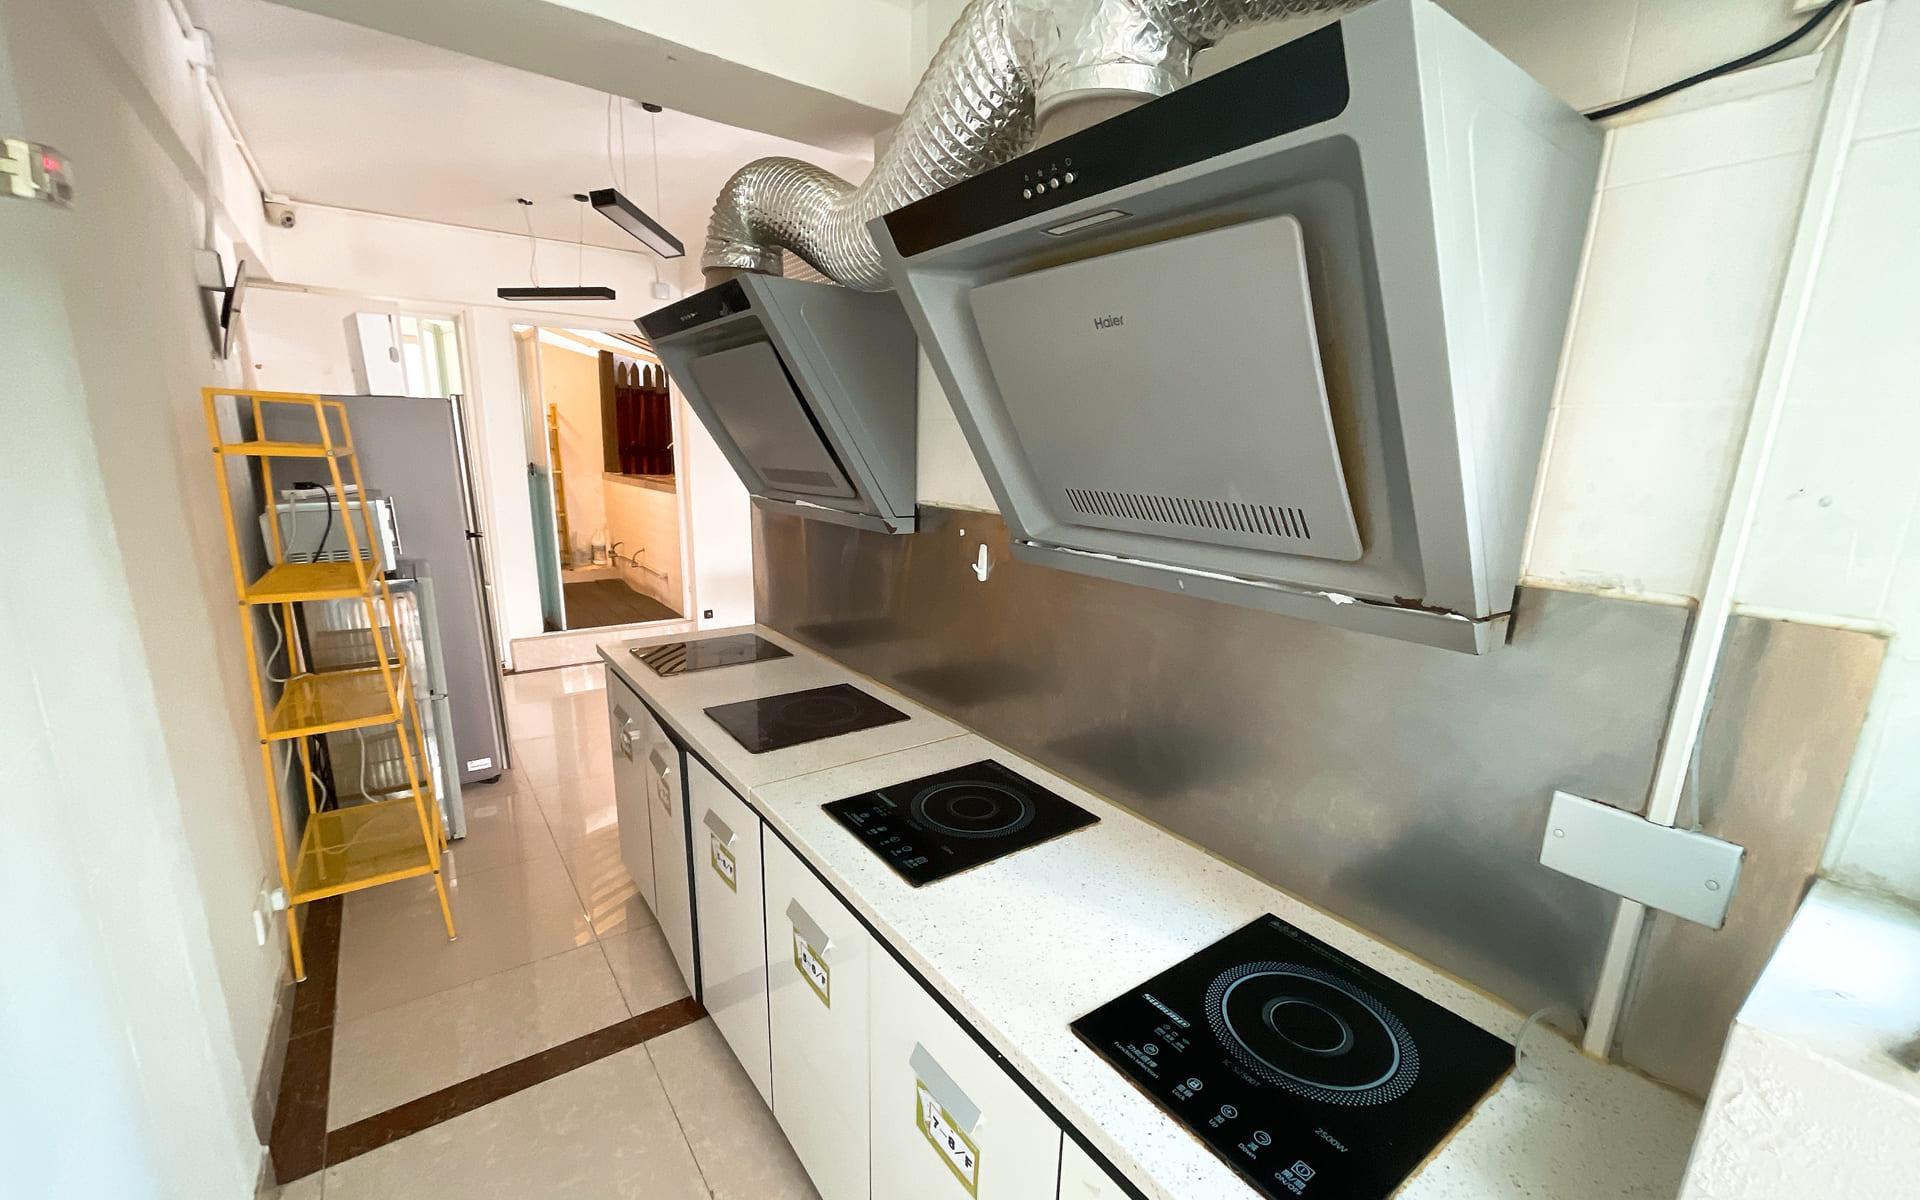 hk_service_apartment_7577208141629432910.jpg